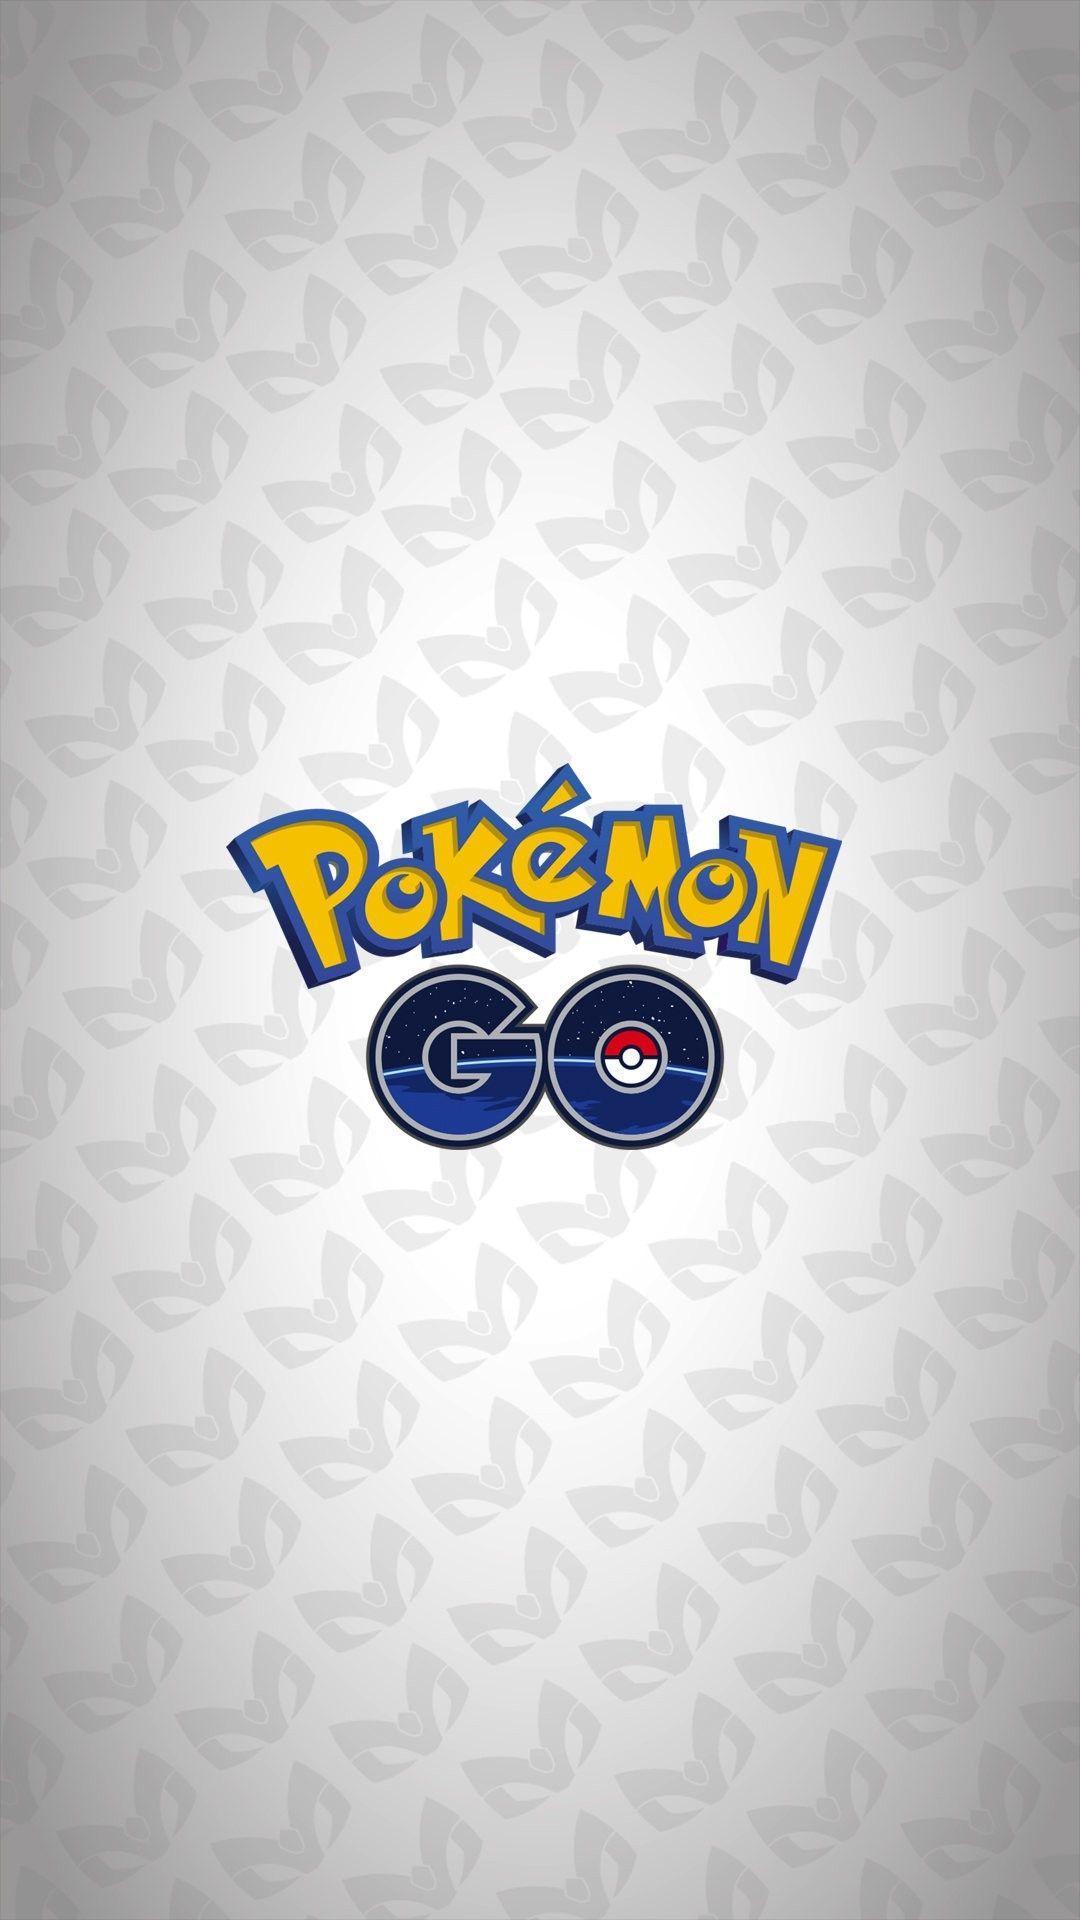 Pokemon Go Wallpapers Top Free Pokemon Go Backgrounds Wallpaperaccess